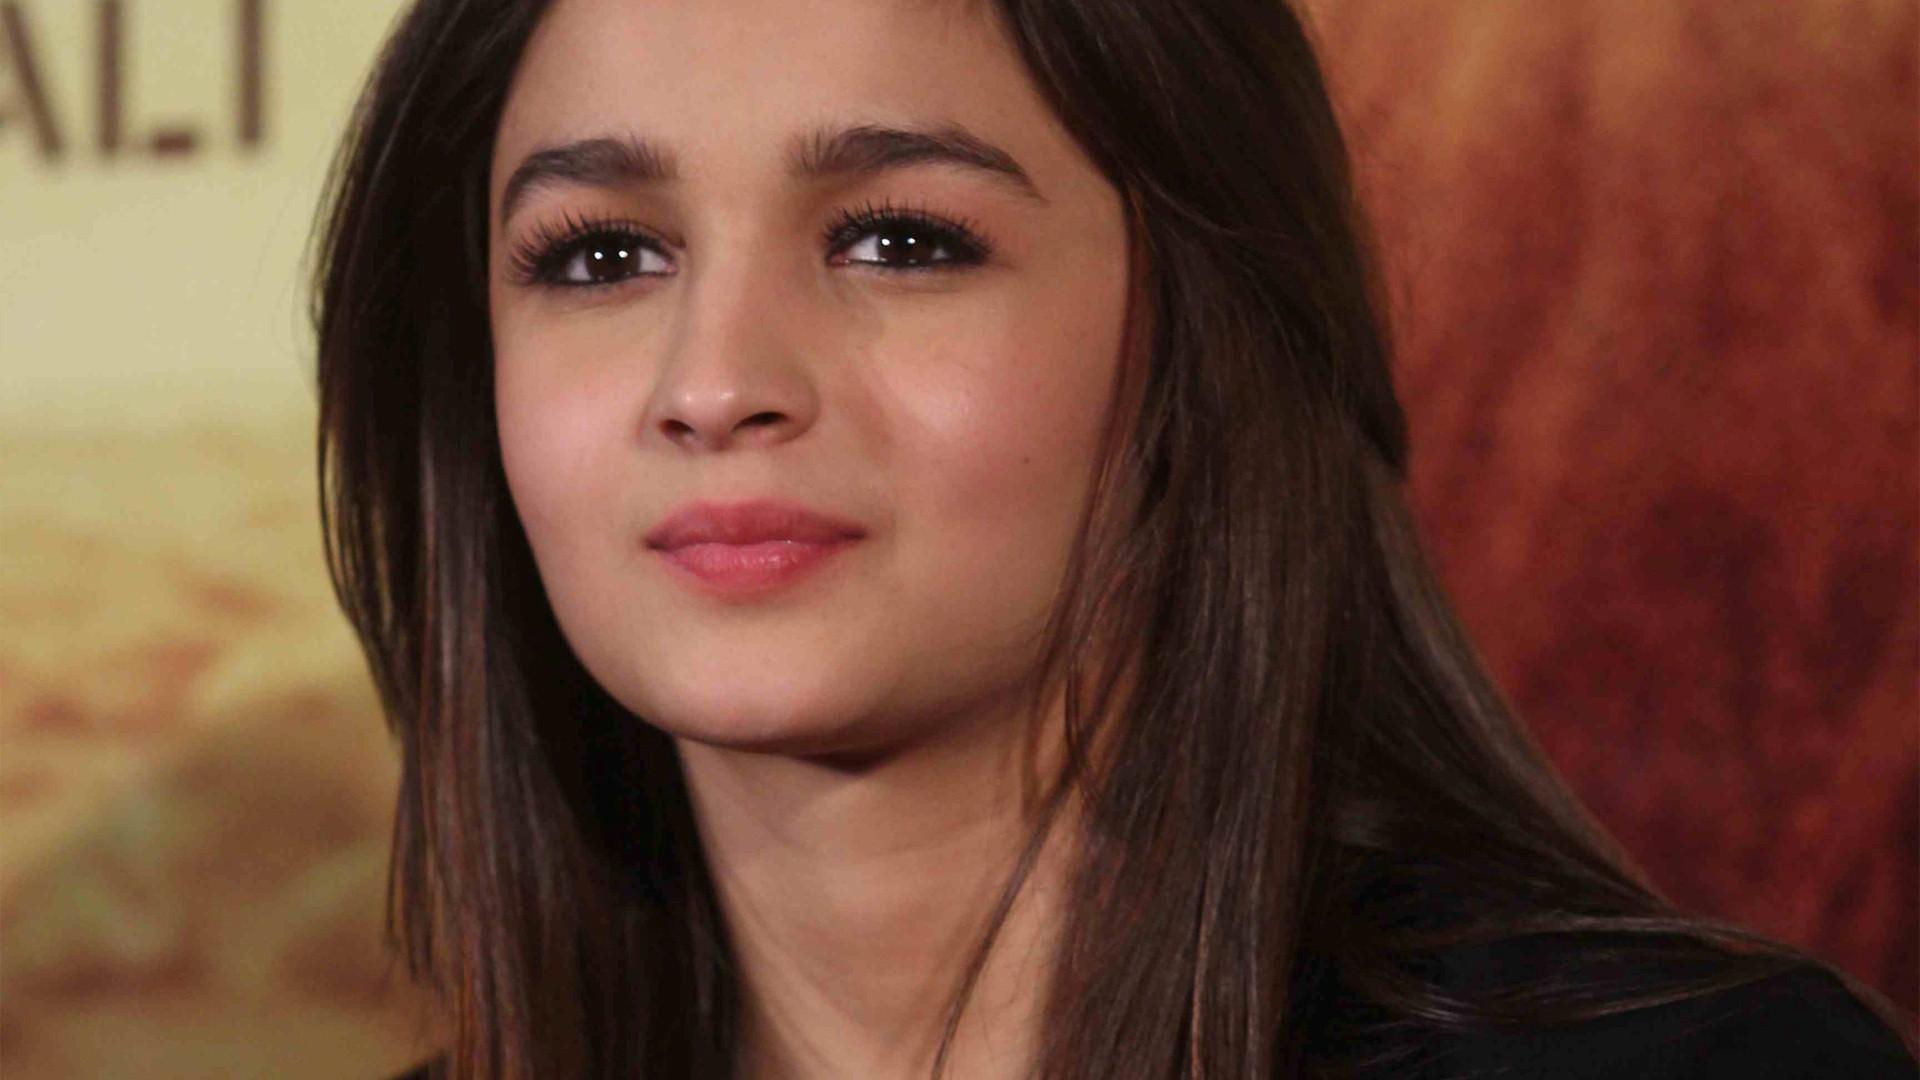 Alia Bhatt Cute Face Lips Close Up Wallpapers - Top 10 Hot Girls In India - HD Wallpaper